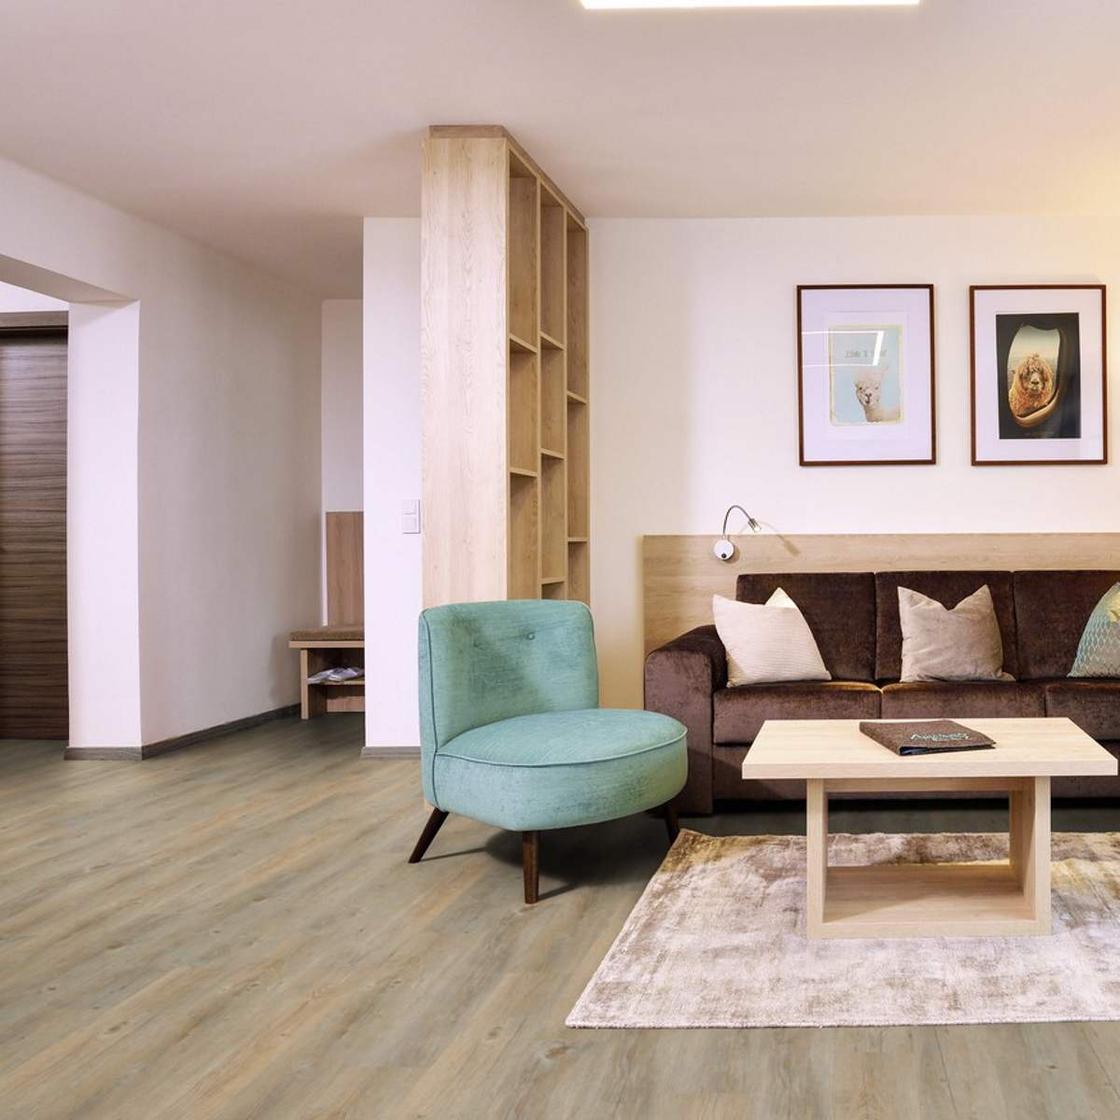 Project Floors Pw 3020 55 Floors Work Vinylboden Gunstig